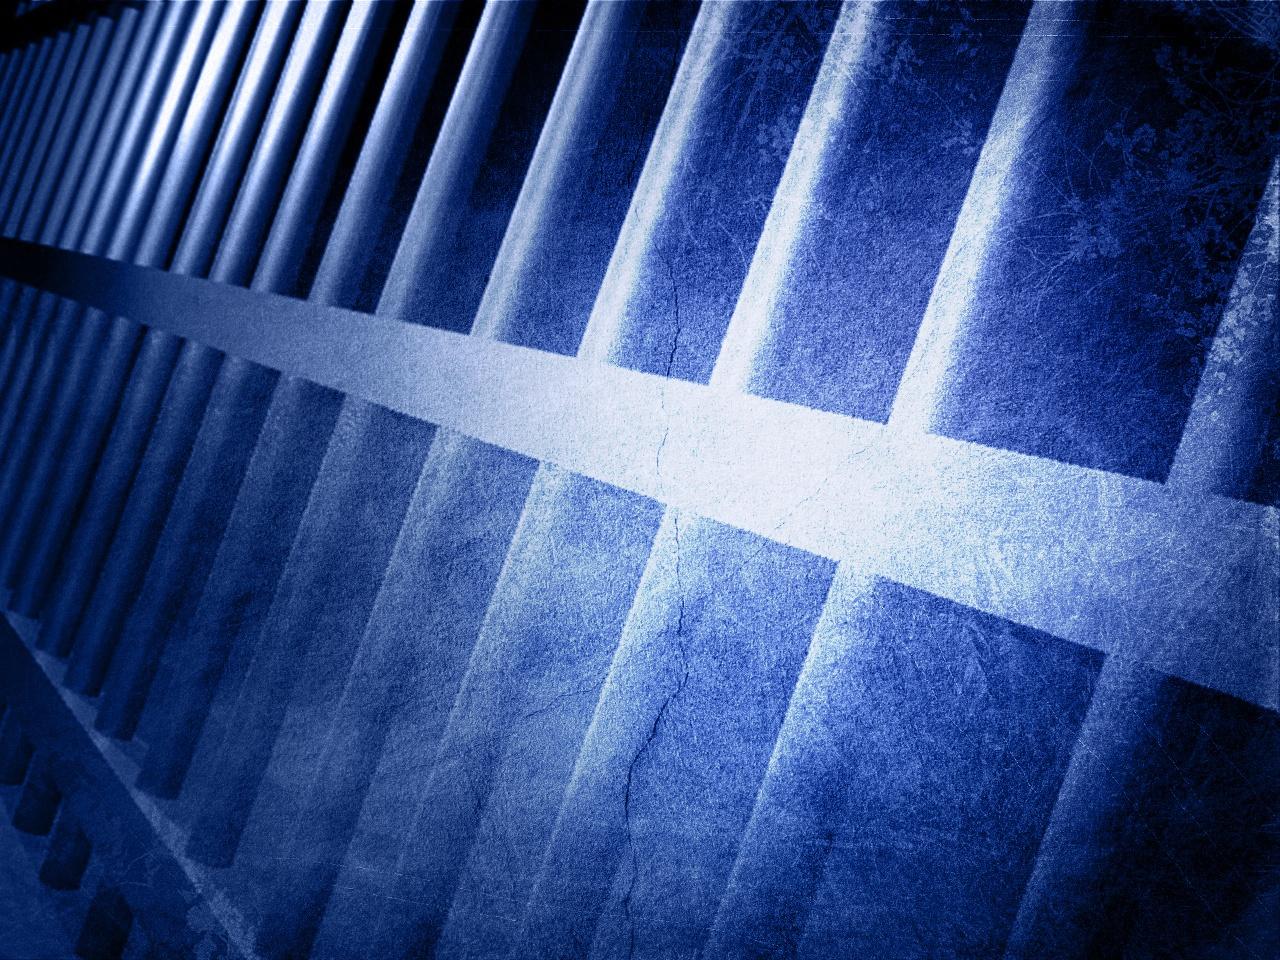 jail_prison_1557434939752.jpg